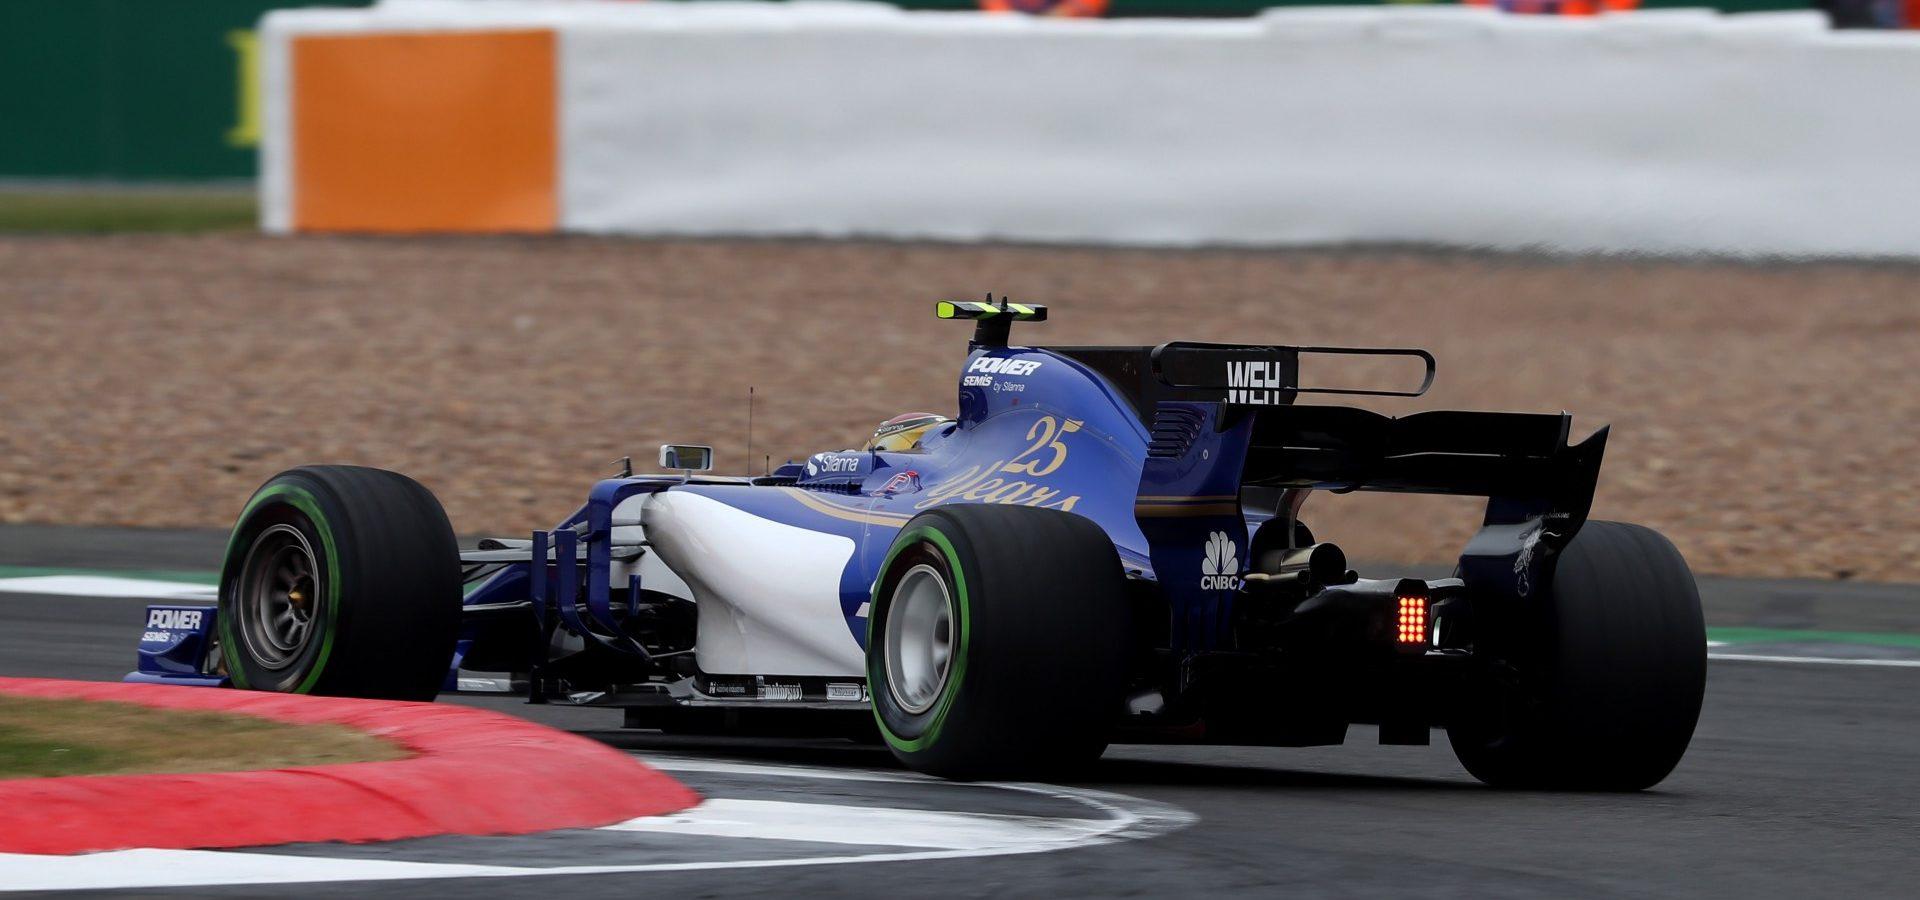 British GP Saturday 15/07/17